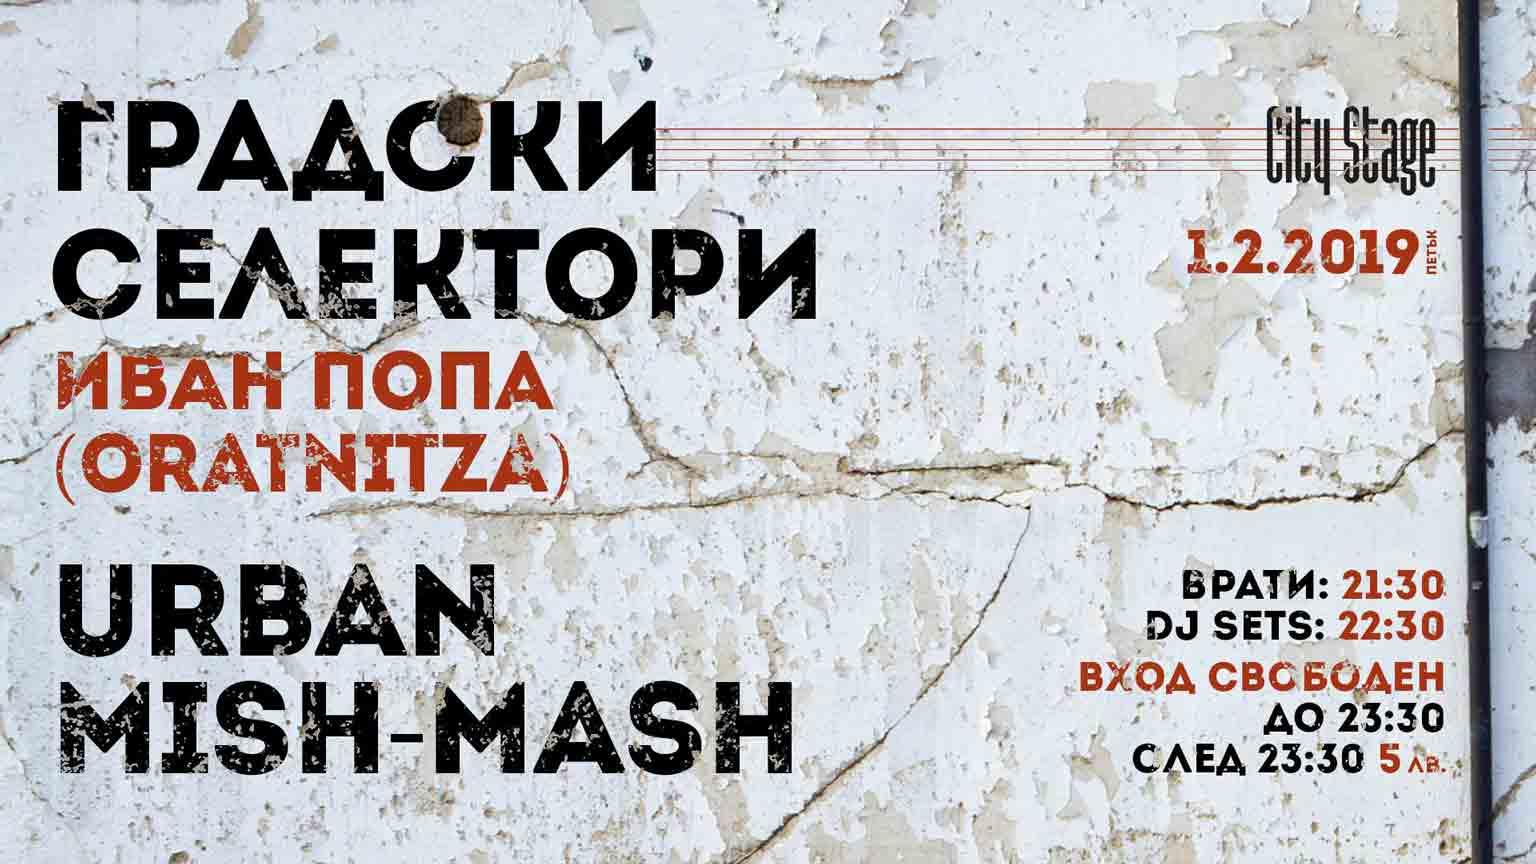 01 февруари 2019 г. 21:30ч. City Stage | Градски селектори: Urban Mish-Mash w/ Ivan Popa (Oratnitza)